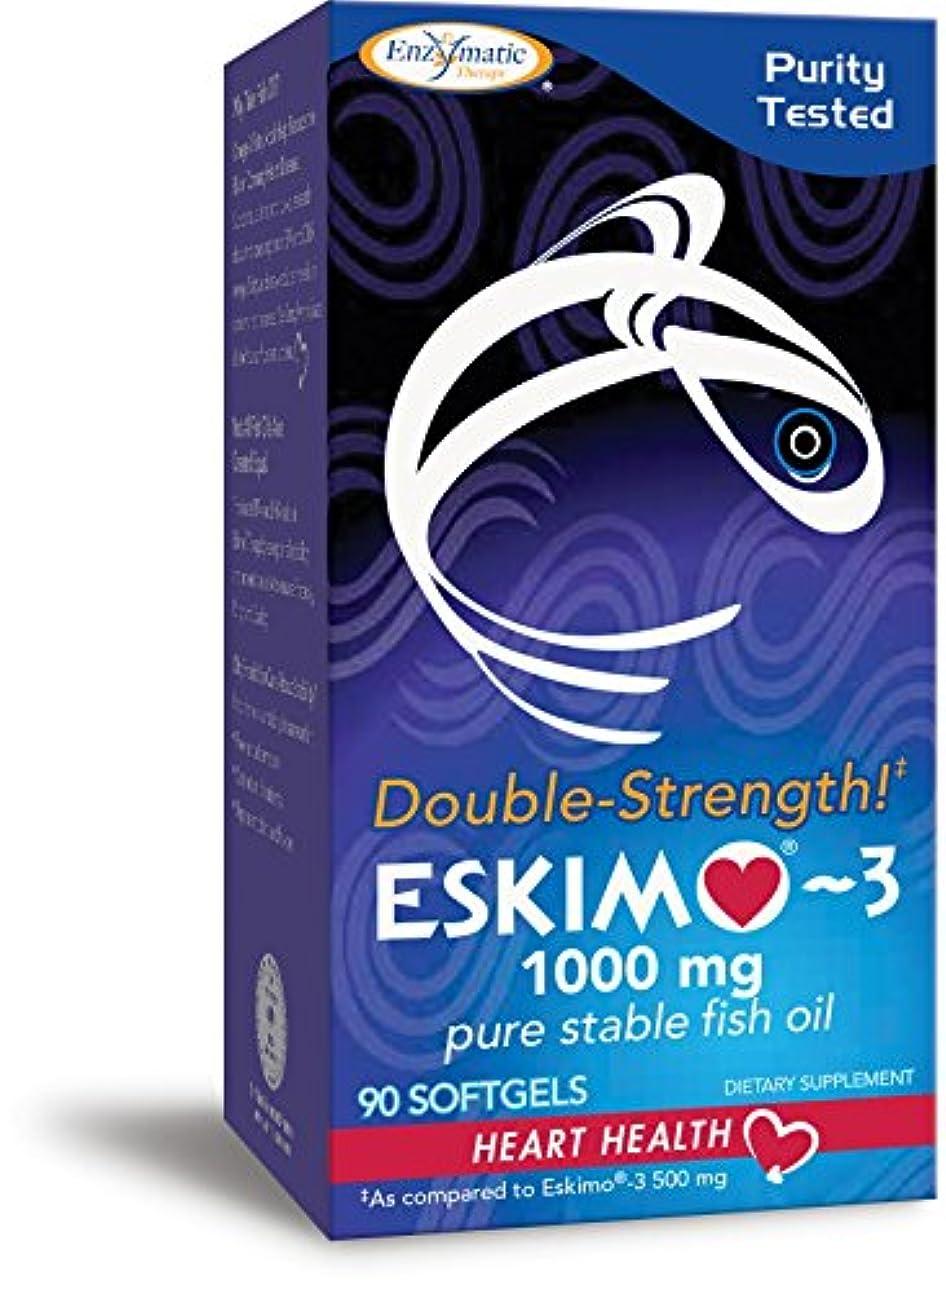 暗殺者祭司肖像画海外直送品 Enzymatic Therapy Eskimo-3 Double-Strength, Double Strength 90 softgels 1000 Mg